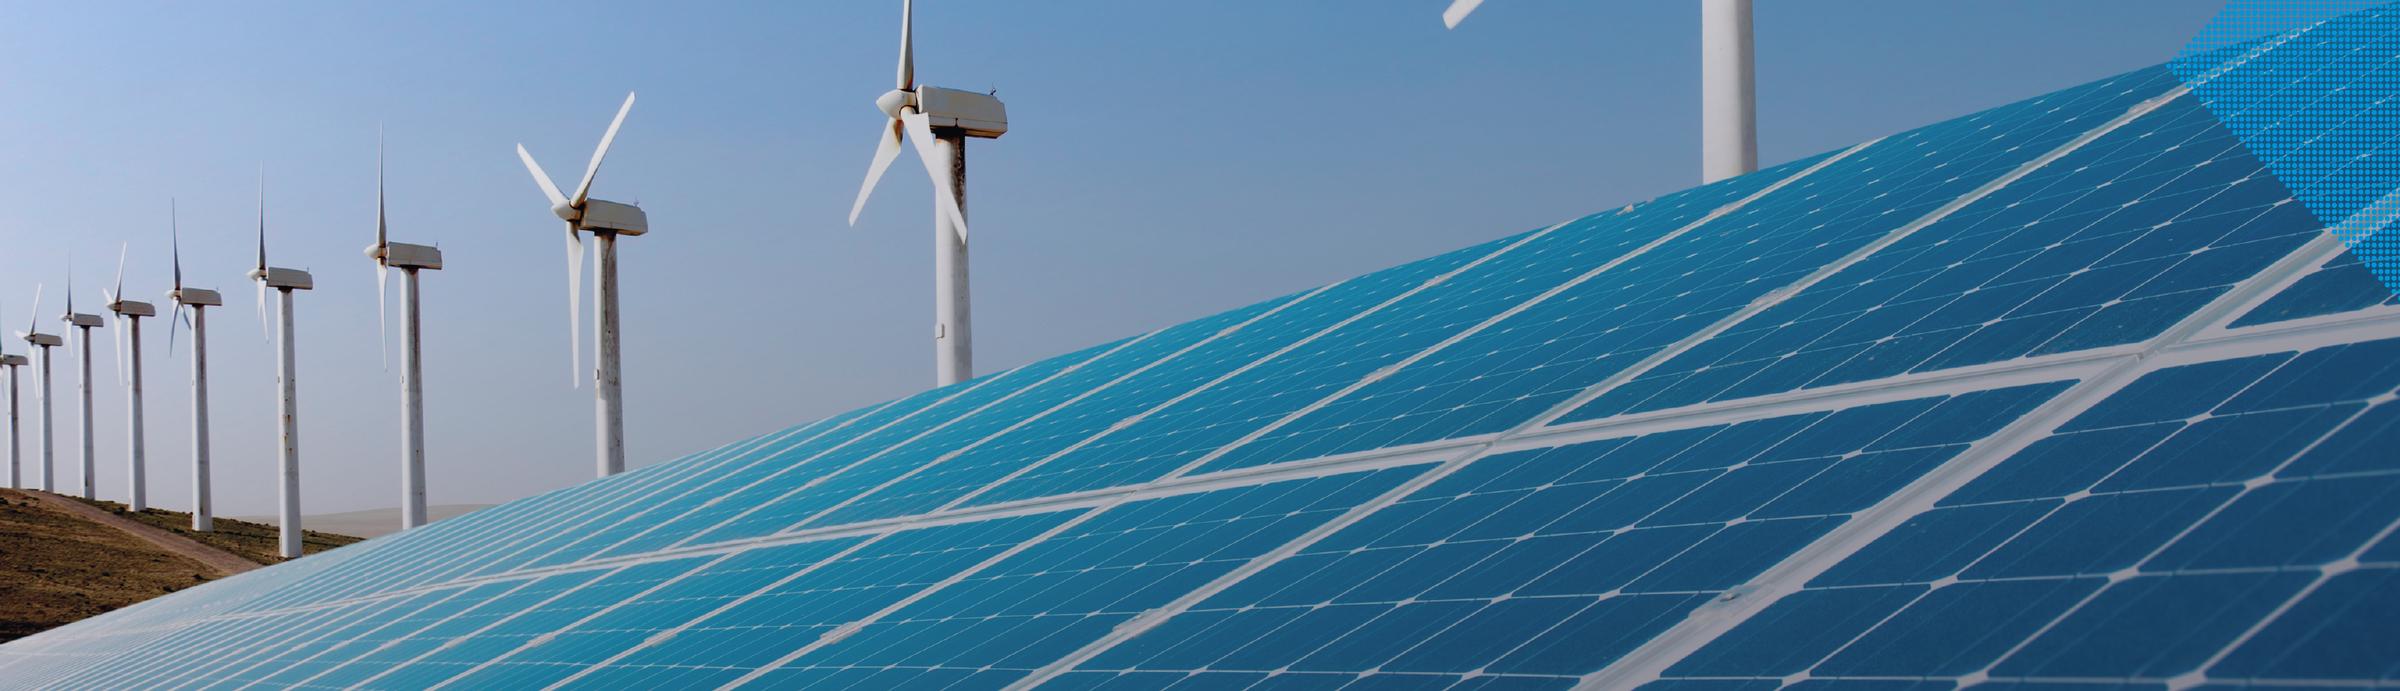 Home - Duurzame energie